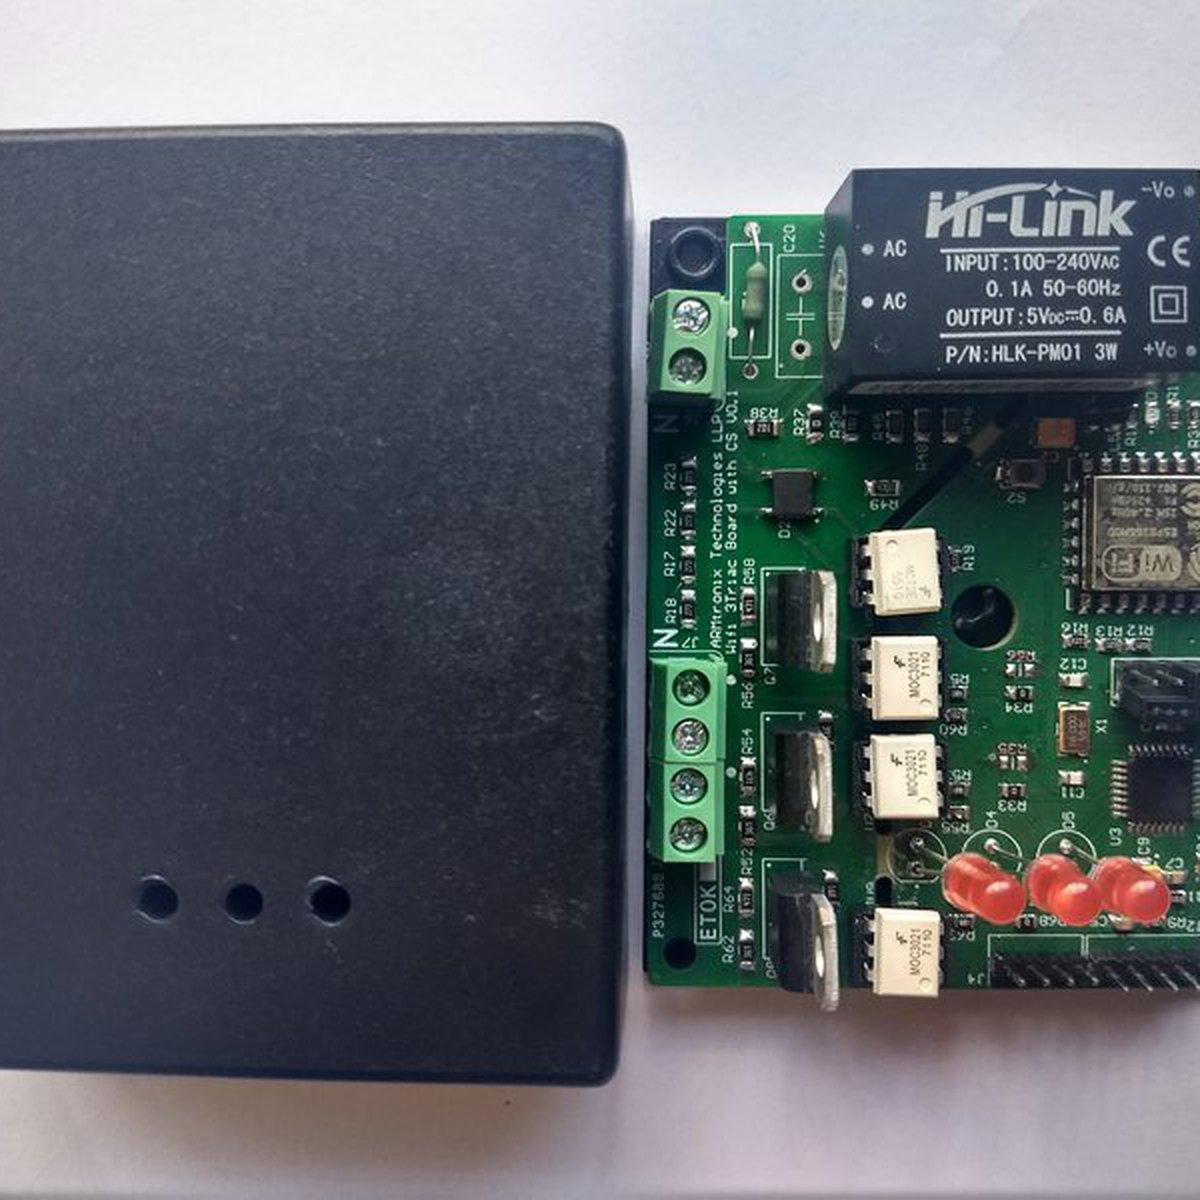 Wifi AC Dimmer Three Triac Board from Armtronix on Tindie